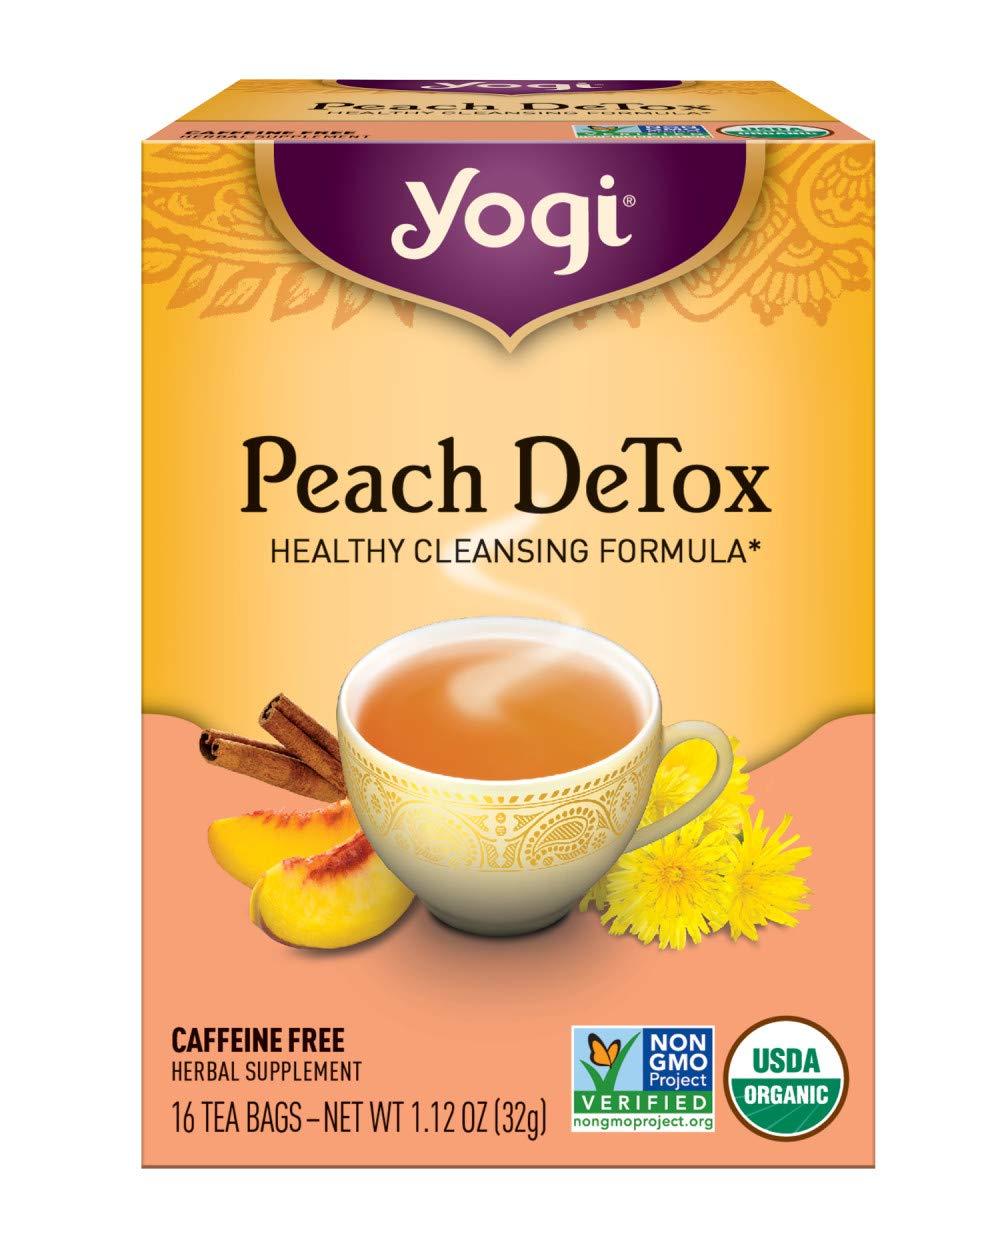 Yogi Tea, Peach DeTox, 16 Count